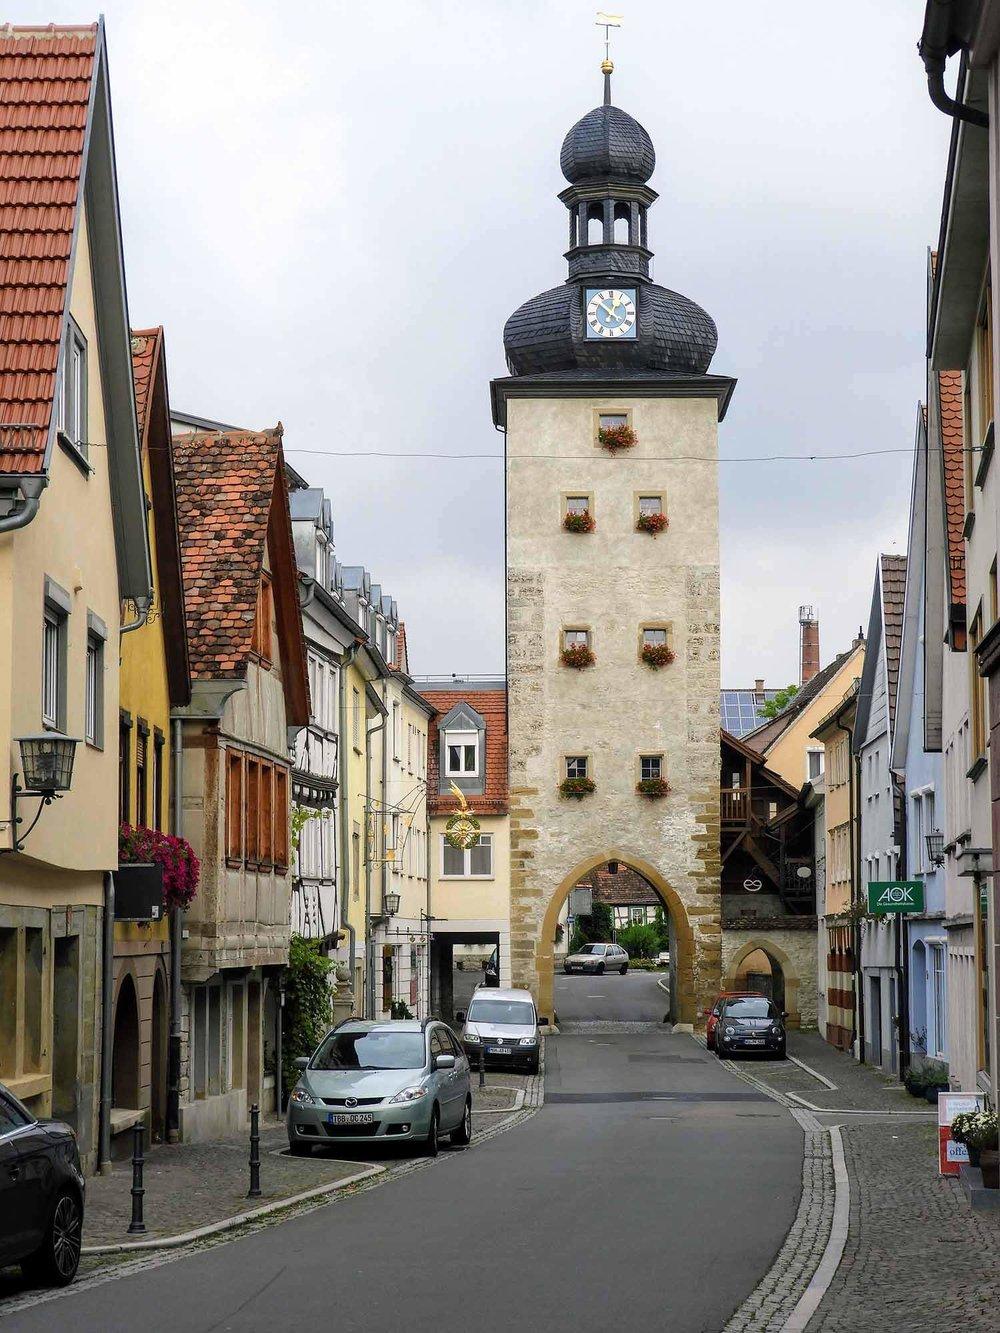 germany-Weikersheim-town-tower-watch.jpg